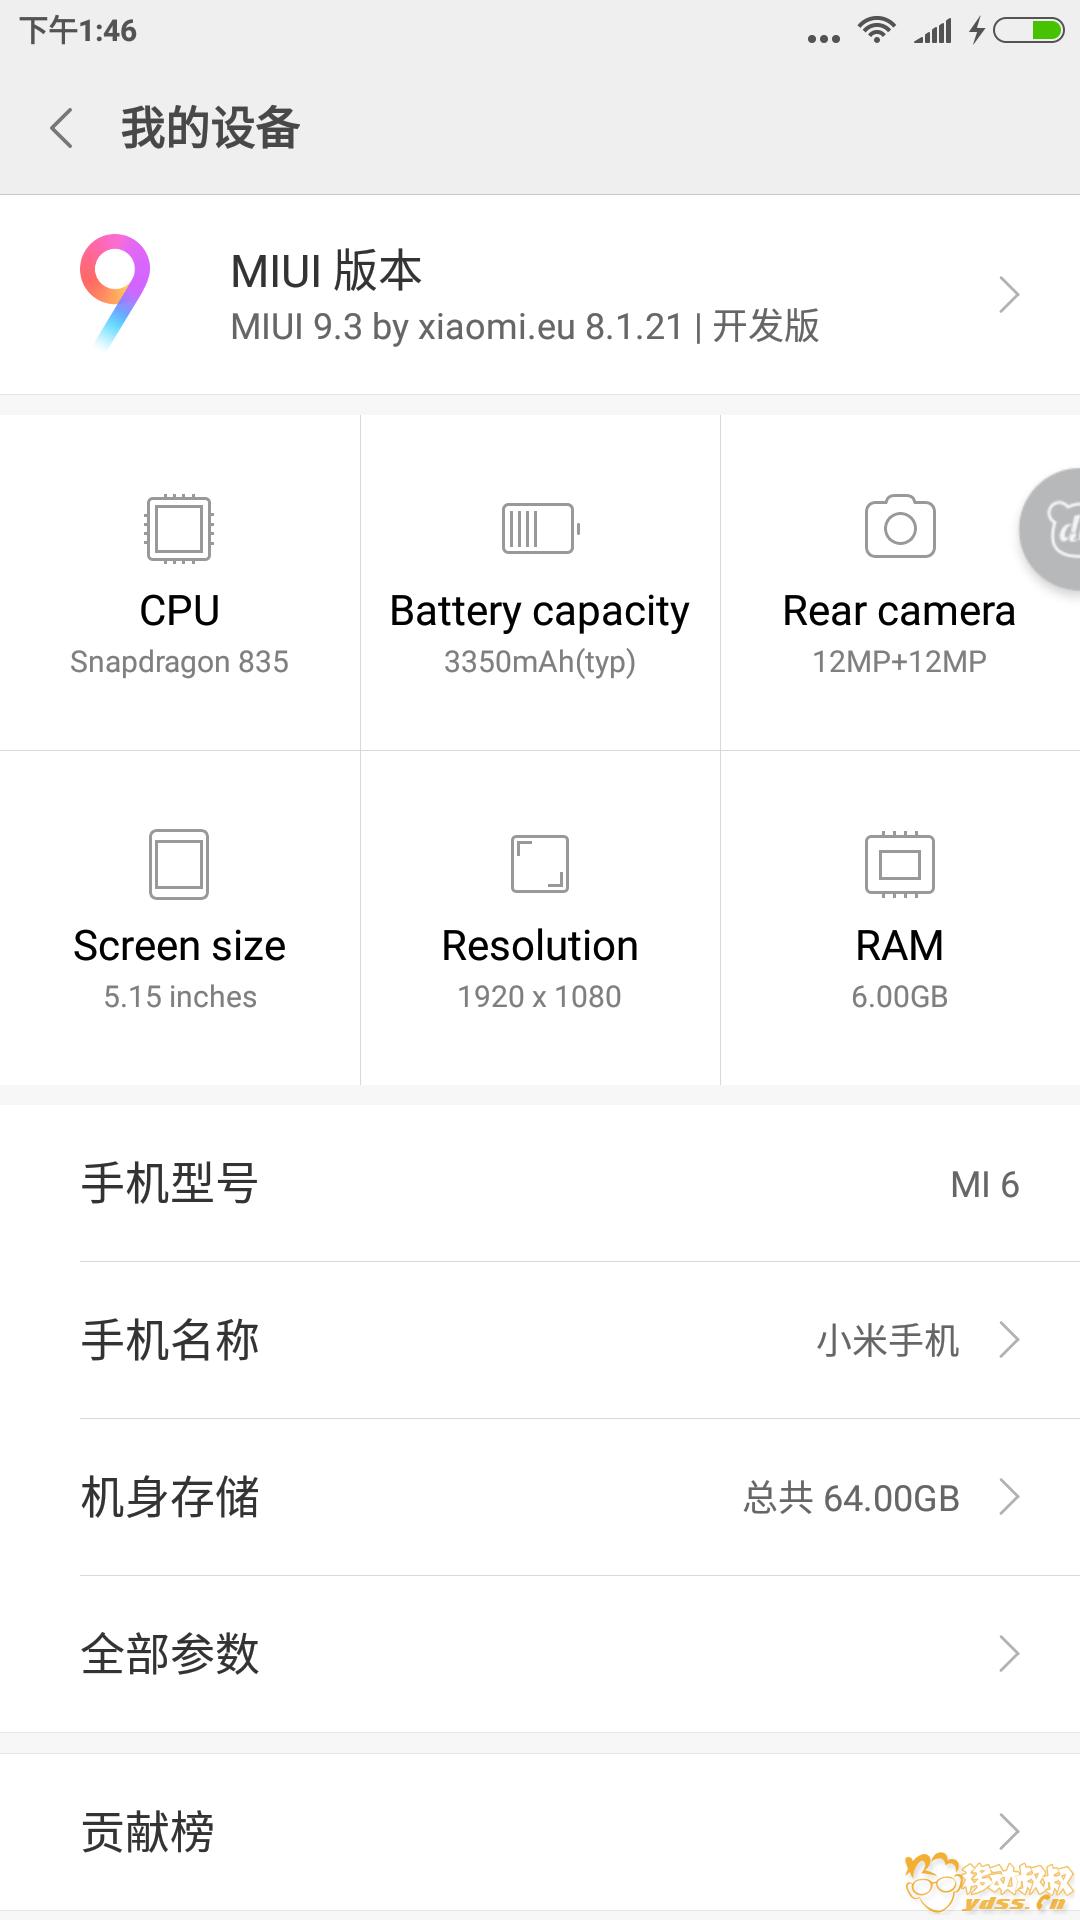 Screenshot_2018-01-21-13-46-44-051_com.android.se.png